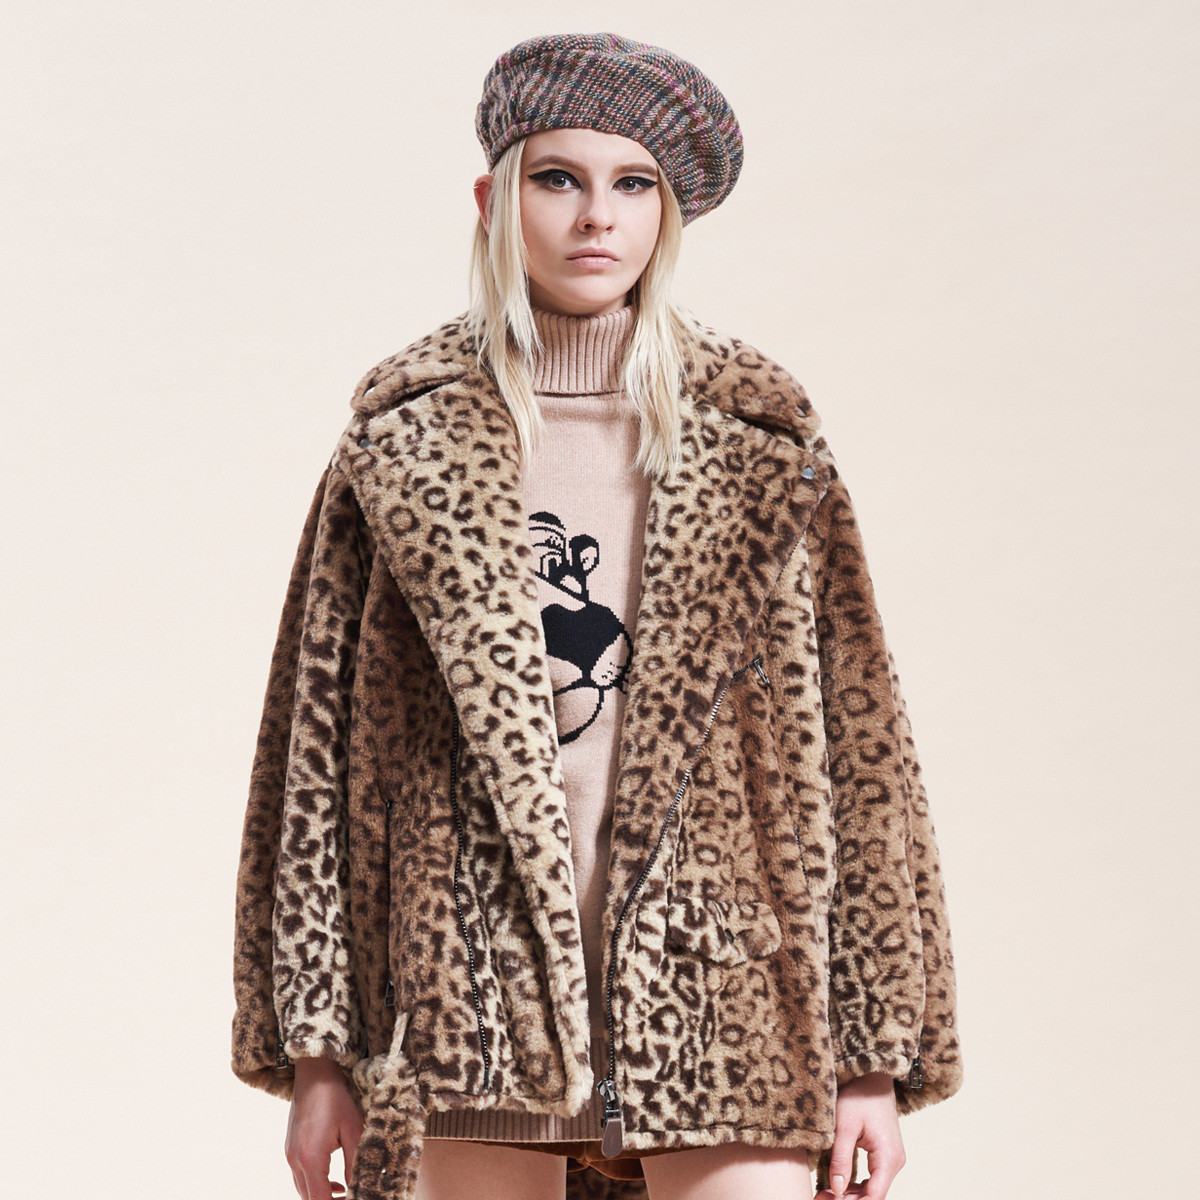 FIVE PLUSFive Plus女冬装豹纹外套女中长仿皮草毛绒夹克宽松长袖翻领2GN4044050810